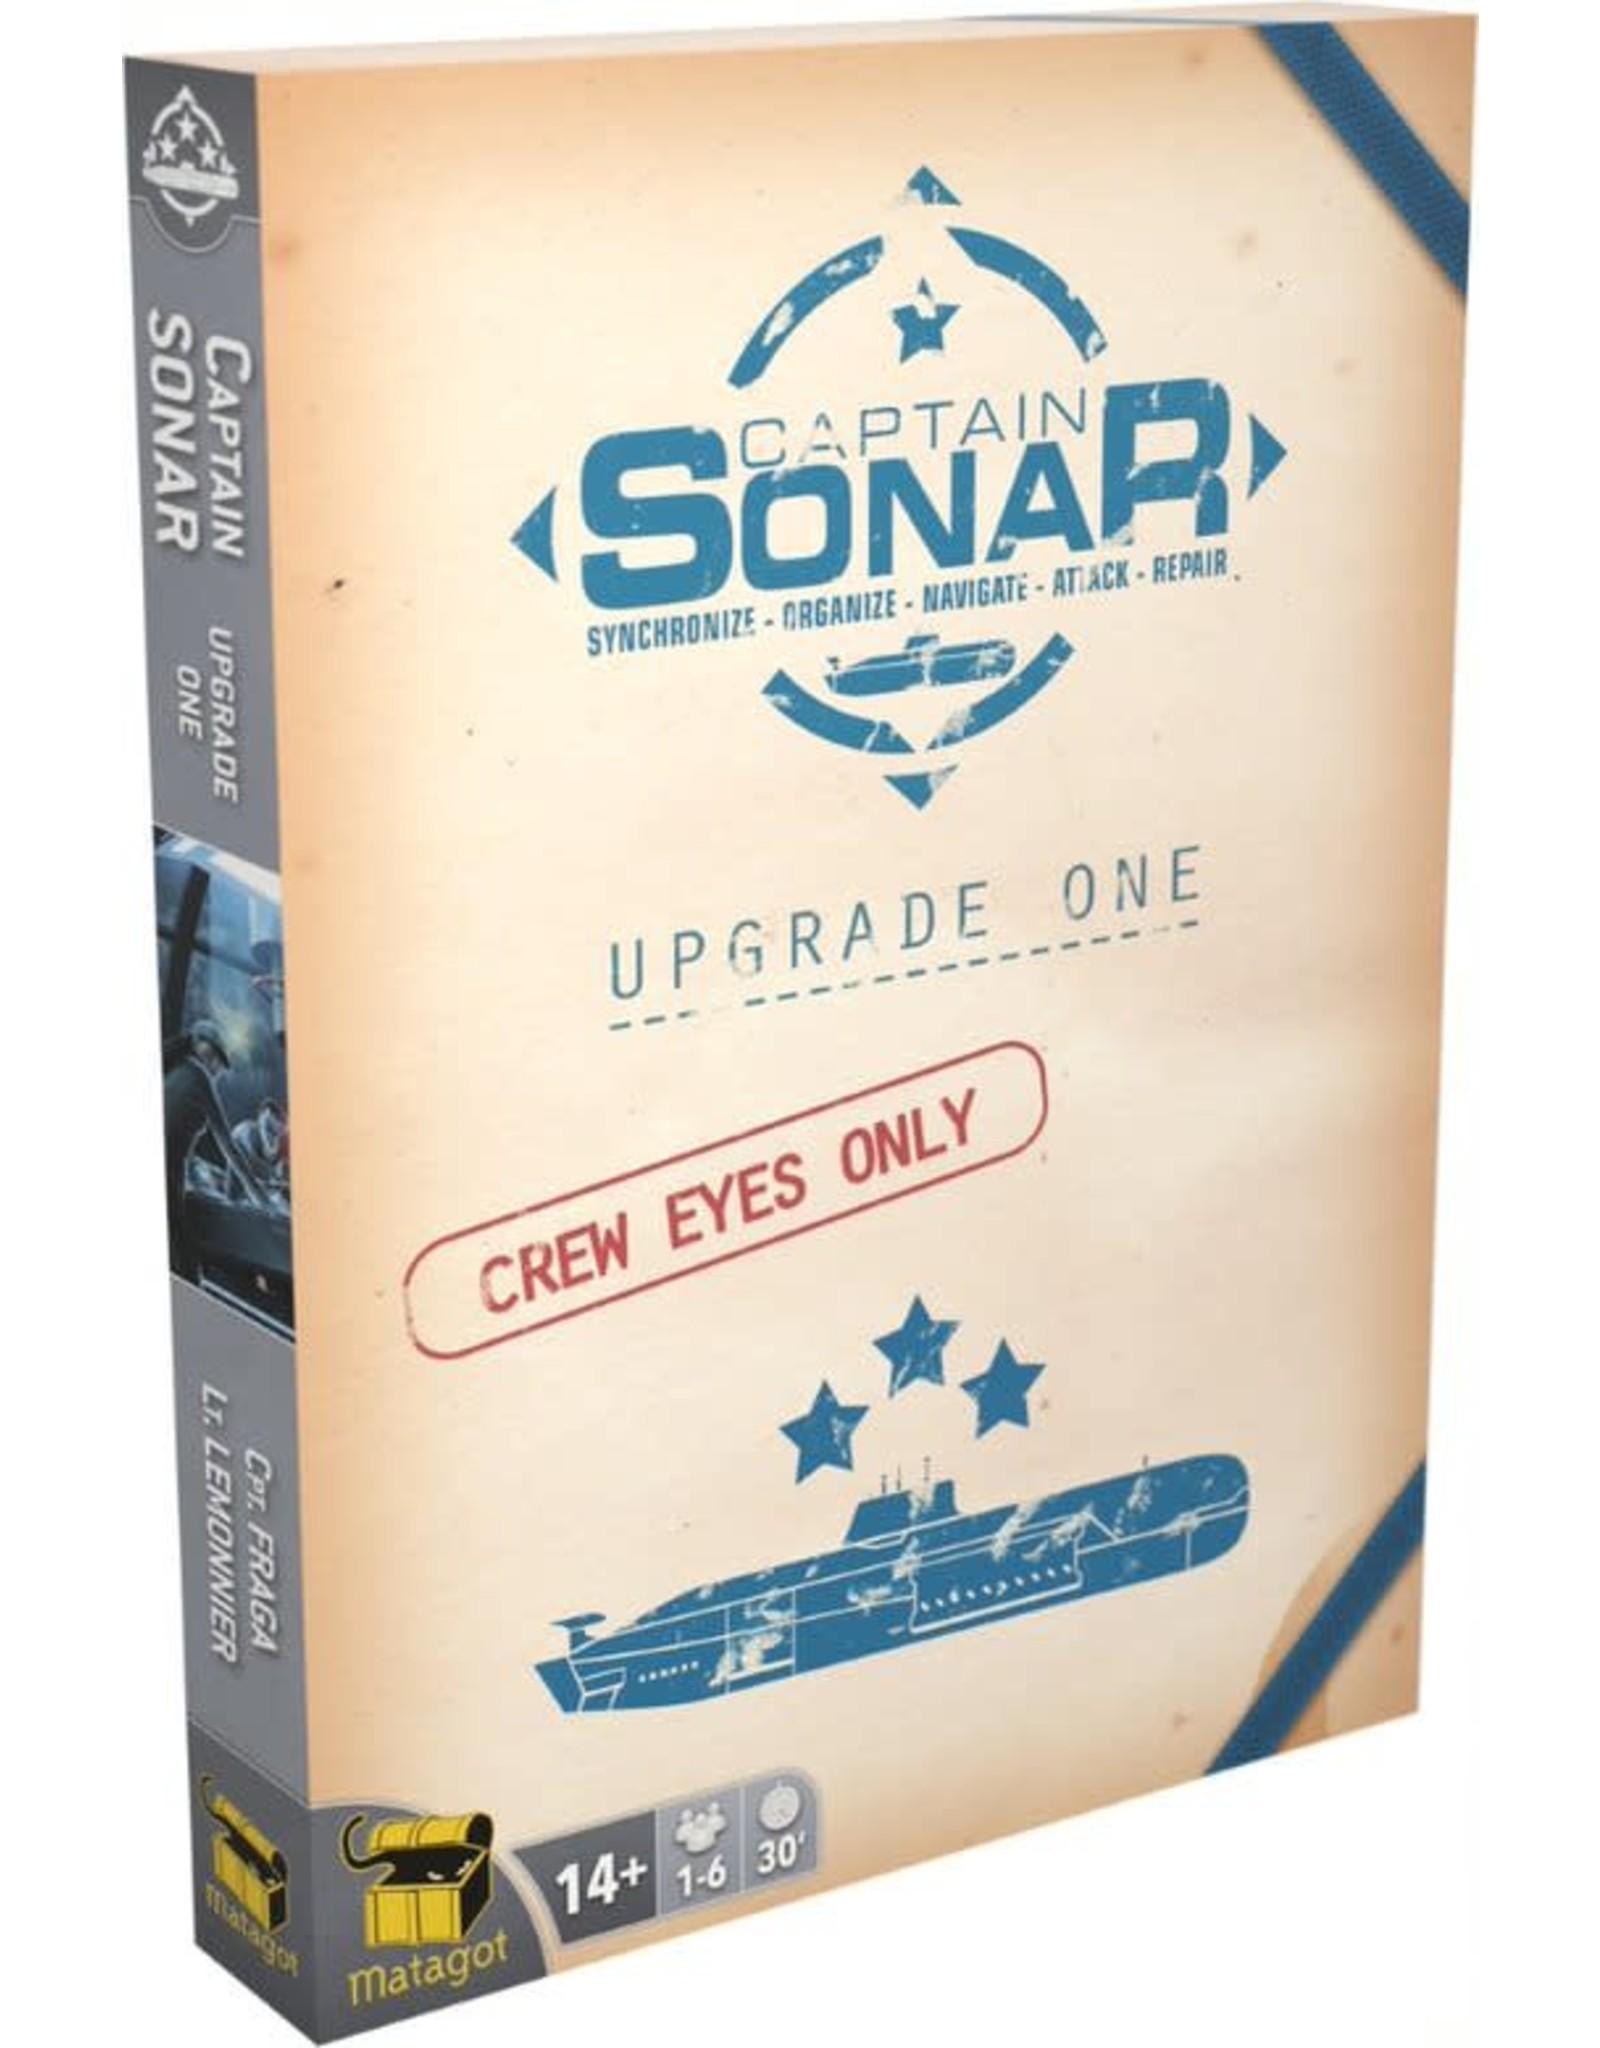 Matagot Captain Sonar / Ext Upgrade 1